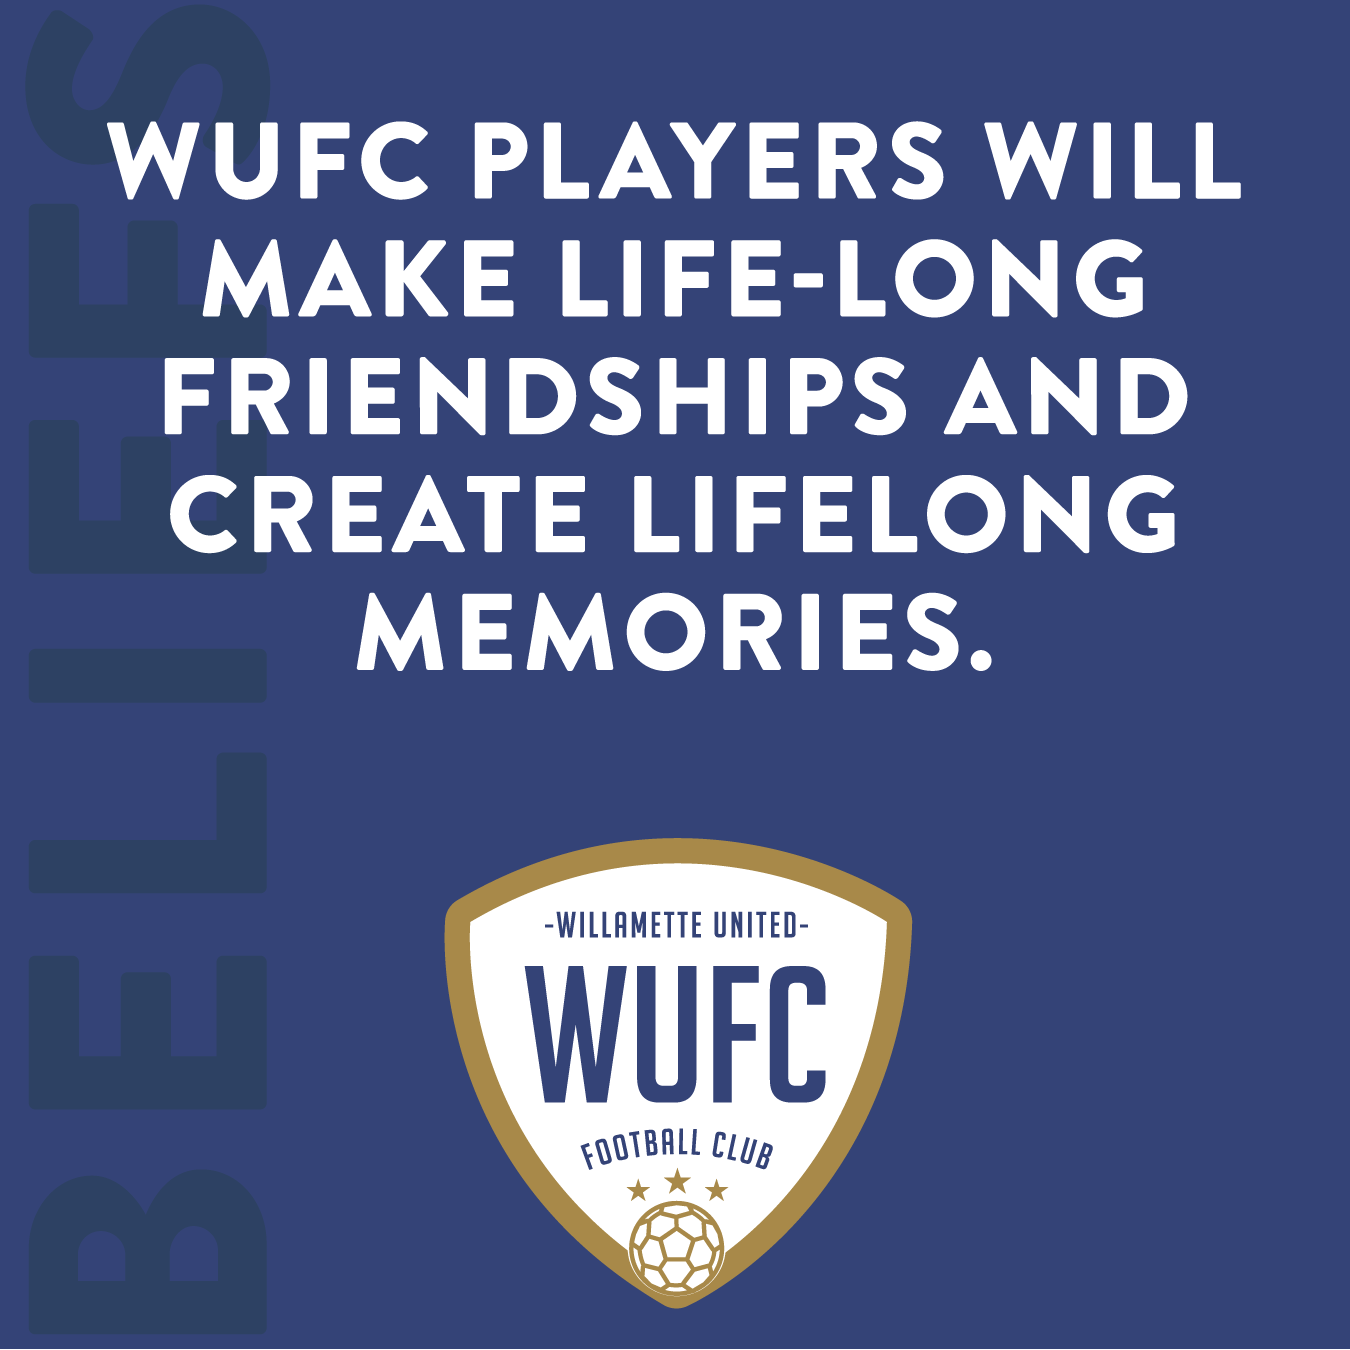 WUFC Belief meme 10-01.png